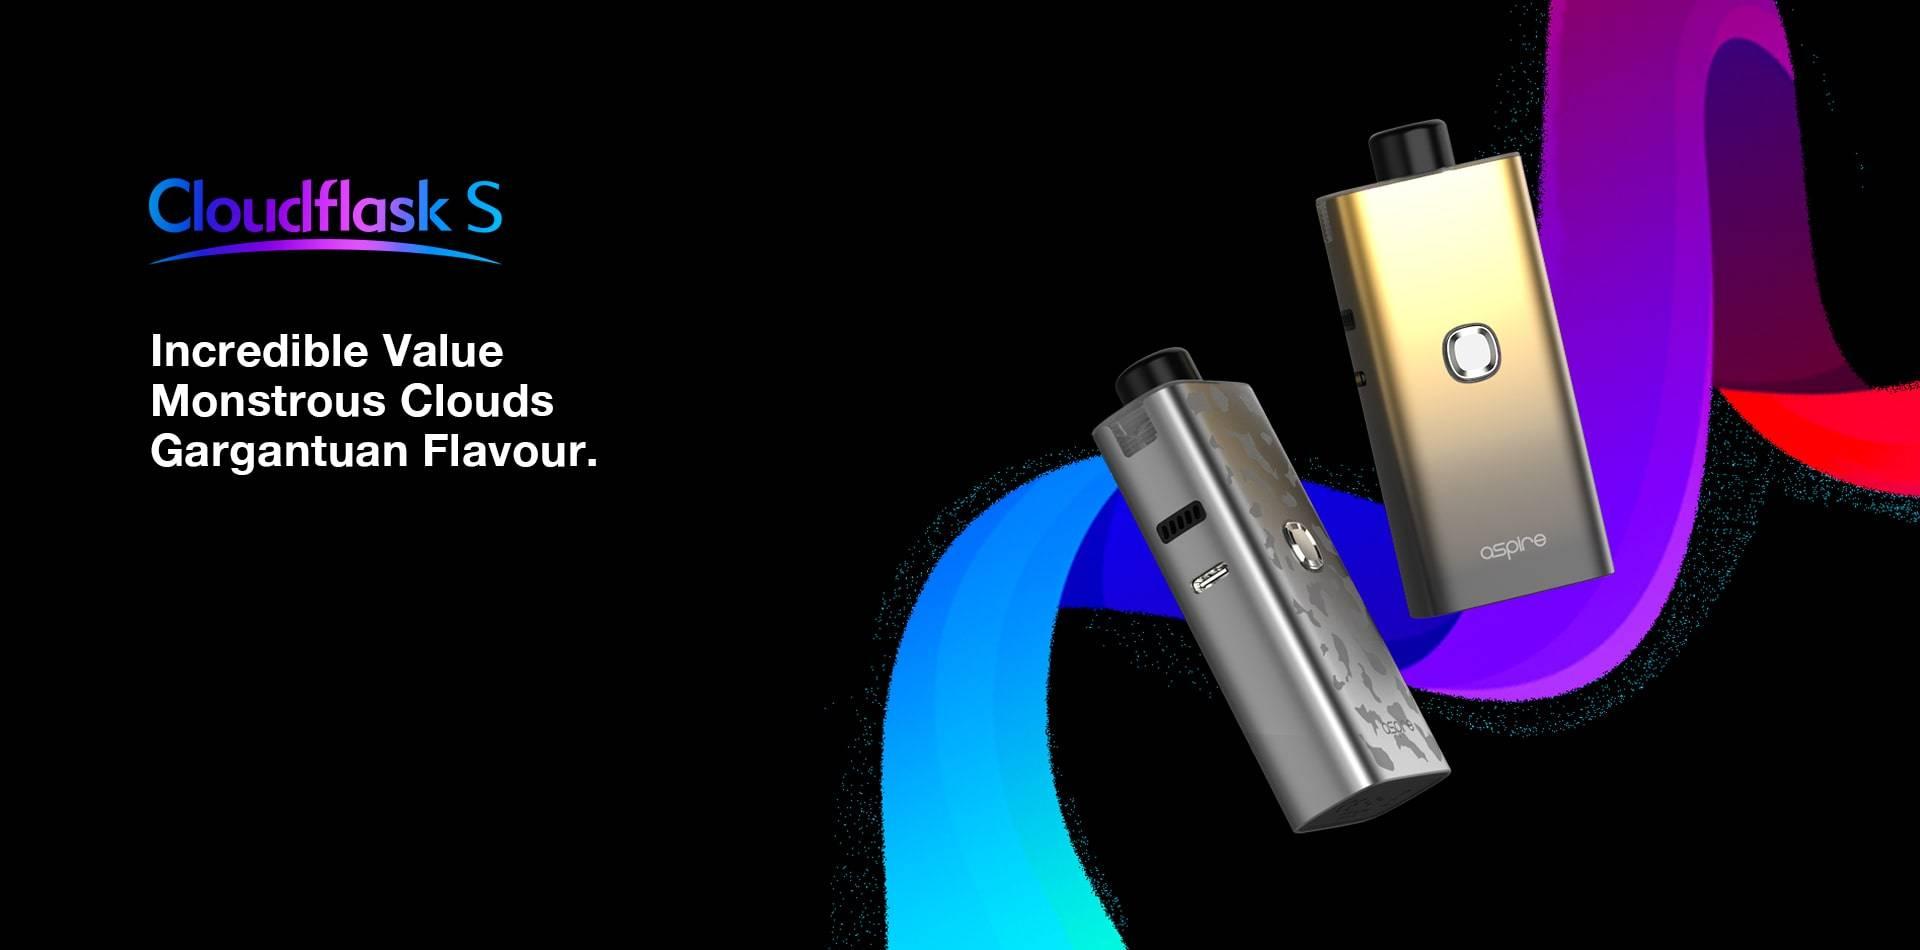 Aspire Cloudflask S - Incredible Value, Monstrous Clouds & Gargantuan Flavour.